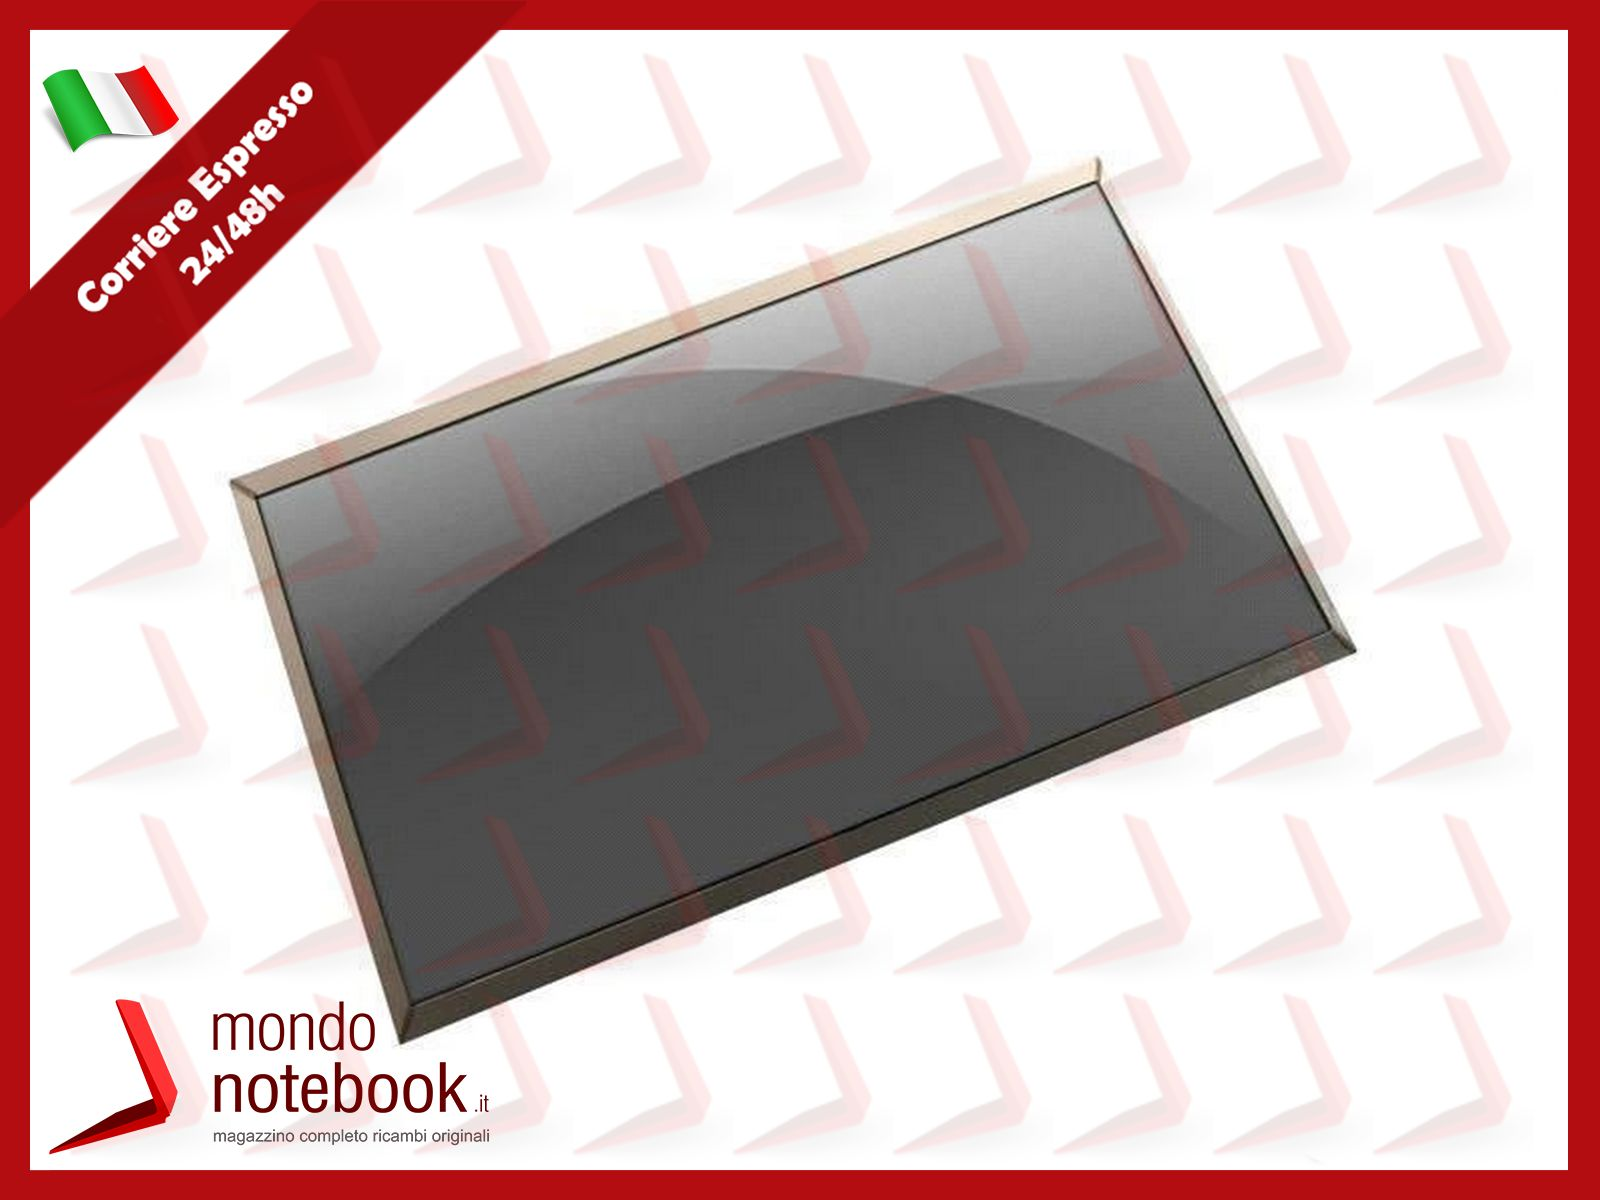 https://www.mondonotebook.it/11032/tastiera-notebook-toshiba-satellite-nb10-nb15-nera-con-frame-silver.jpg